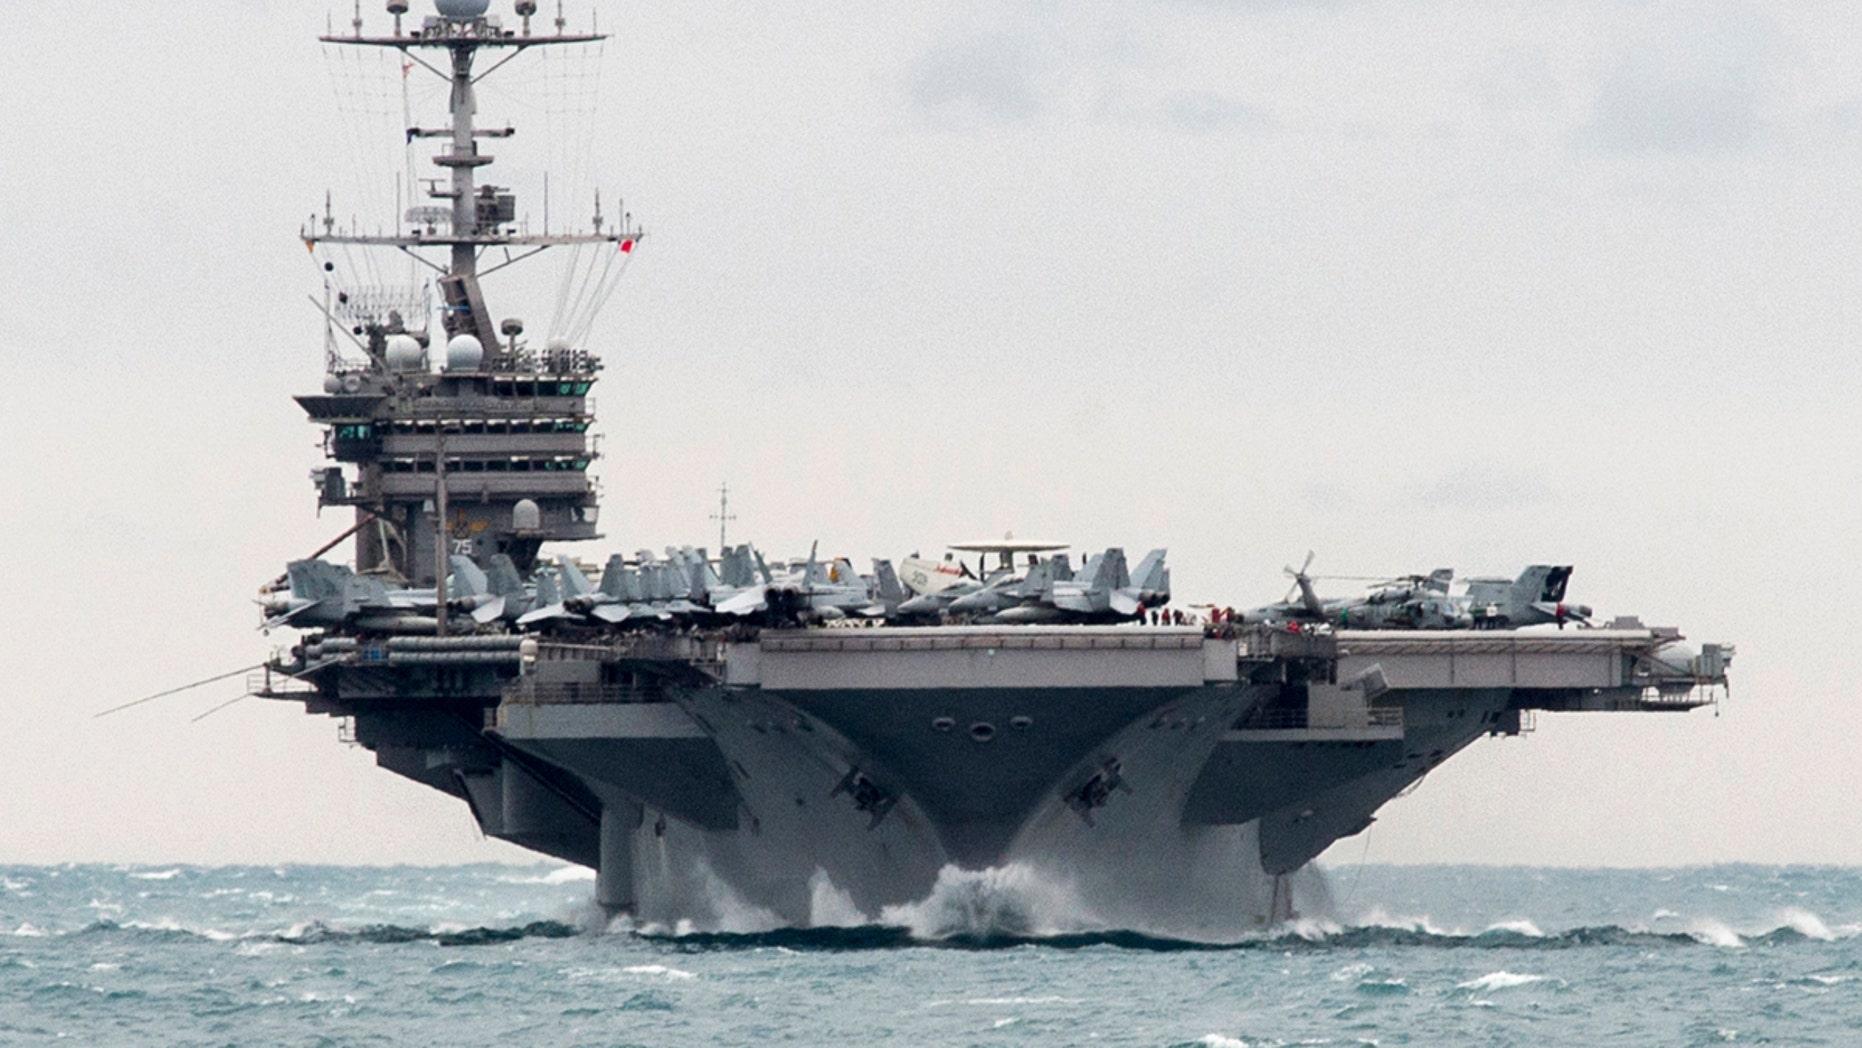 FILE:  2015: Aircraft carrier USS Harry S. Truman in the Strait of Hormuz. (U.S. Navy via AP)